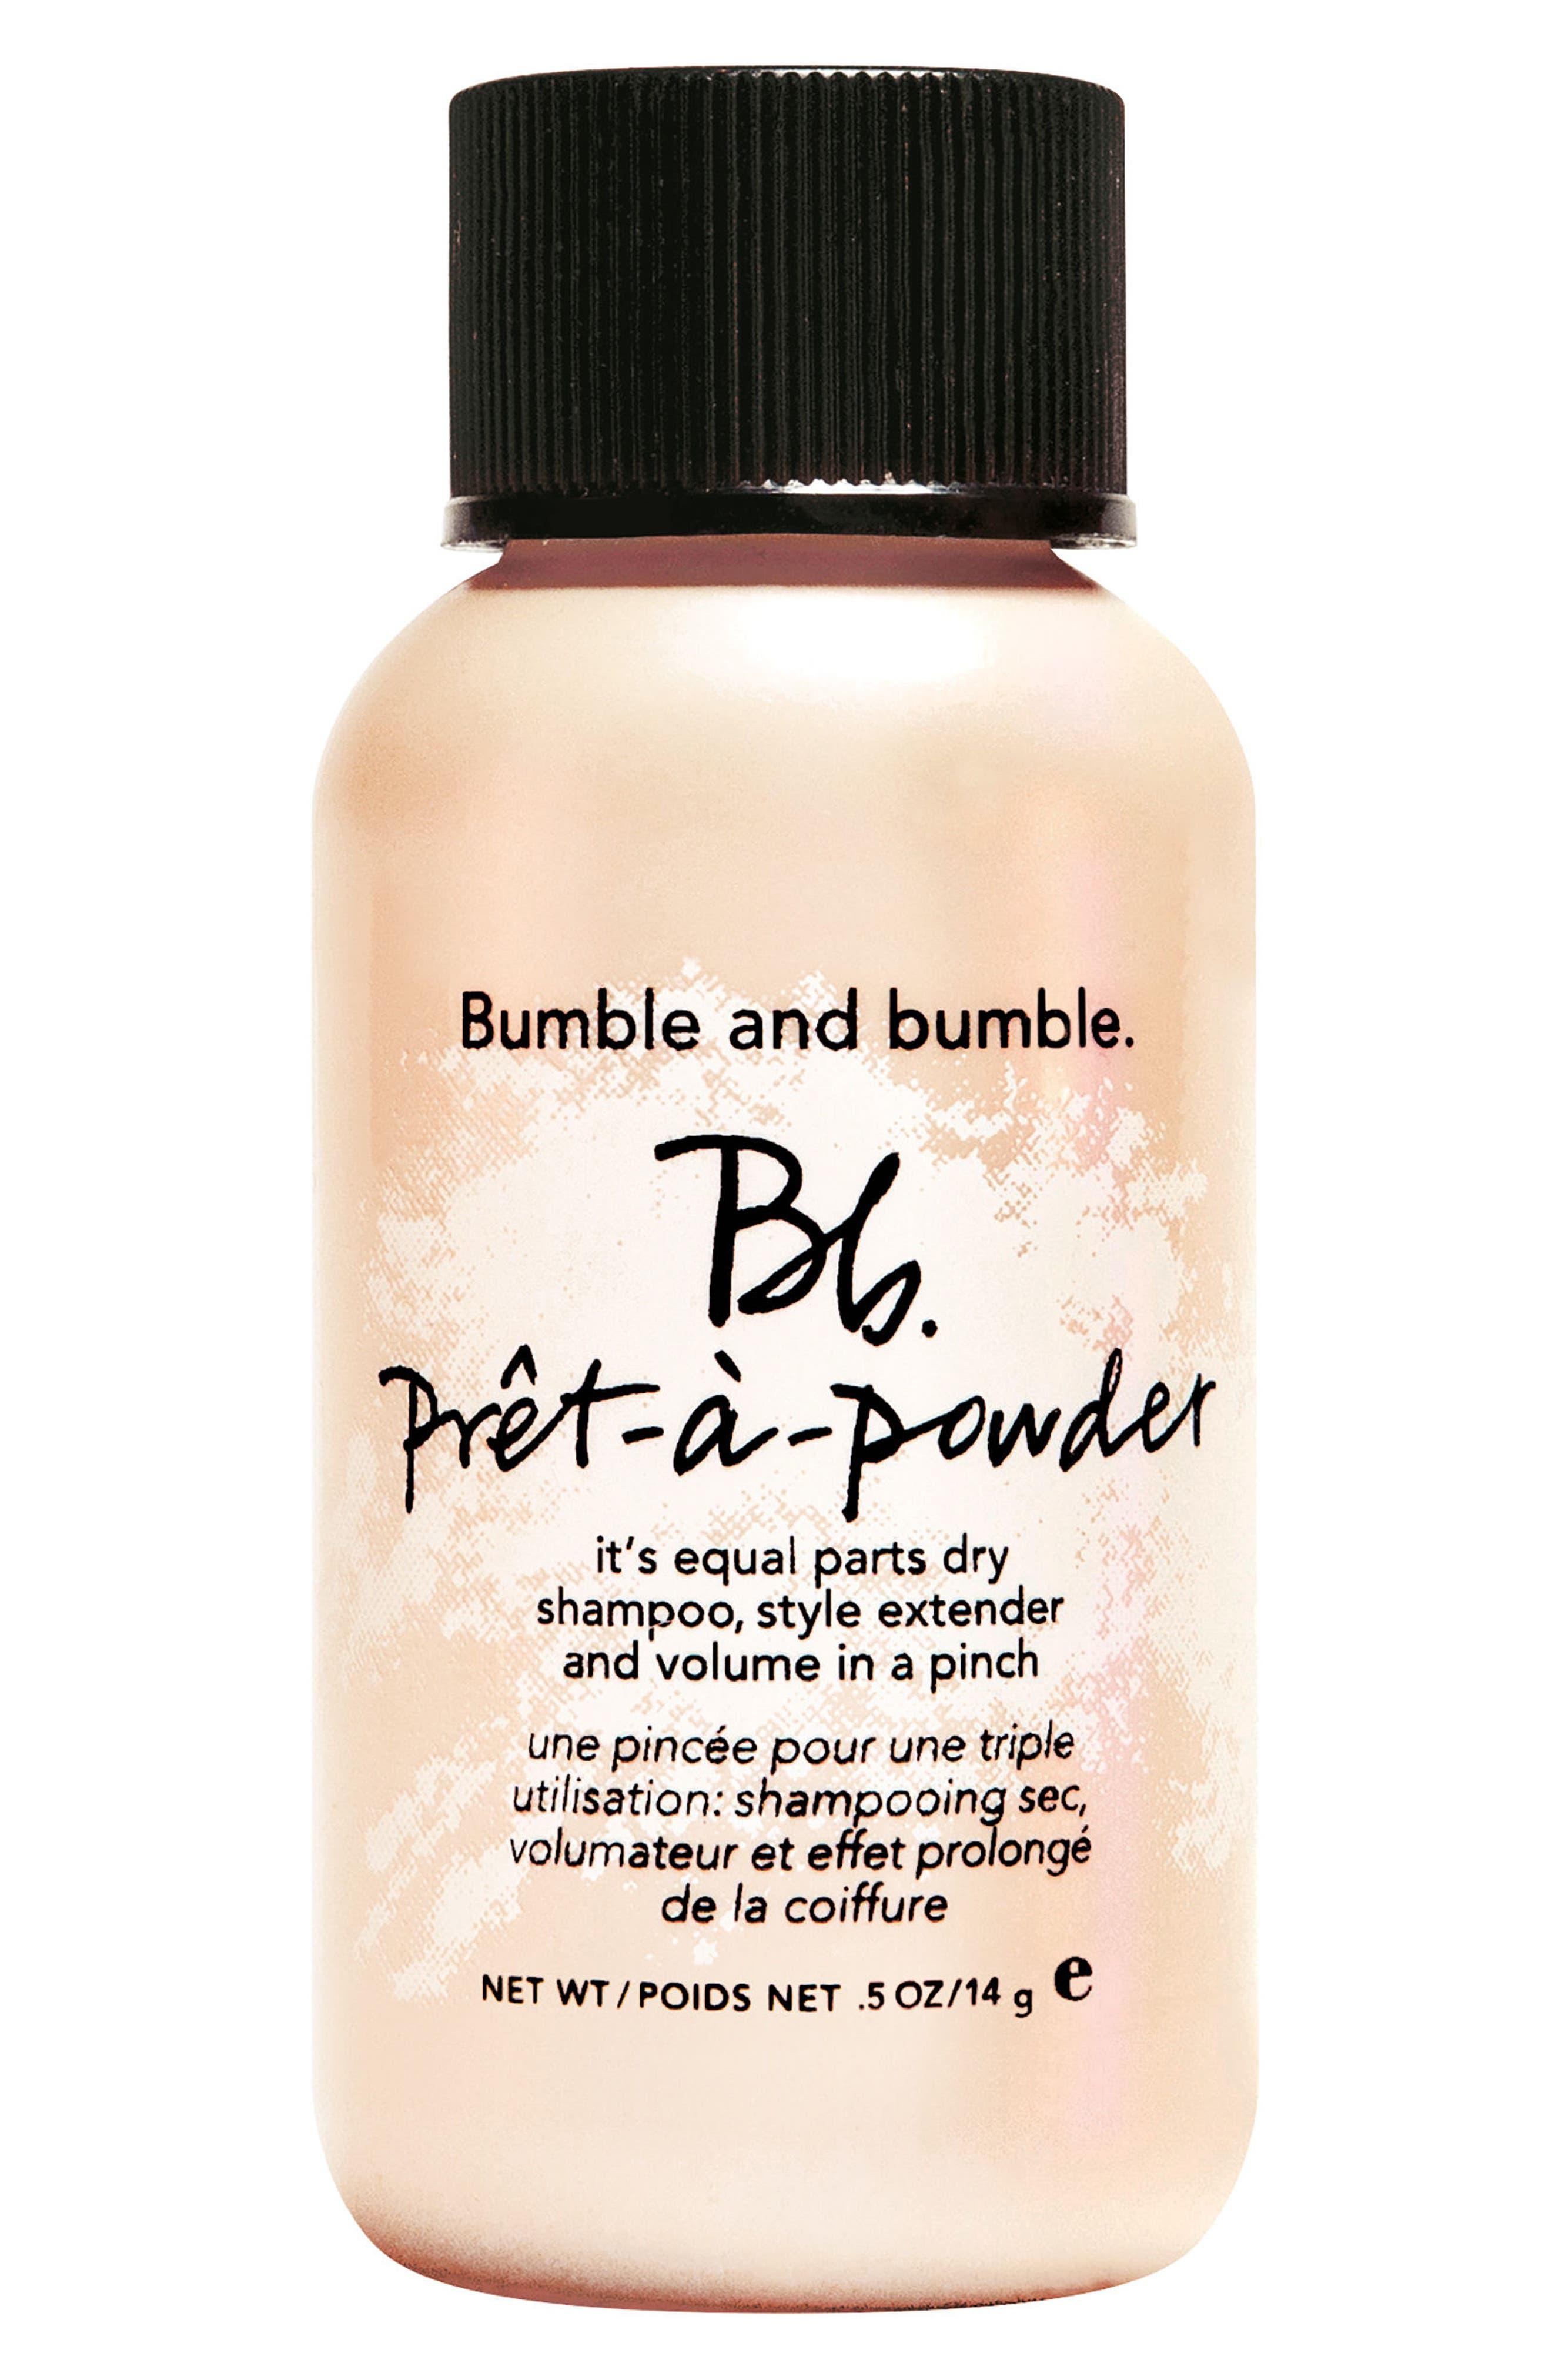 Bumble and bumble Prêt-a-Powder